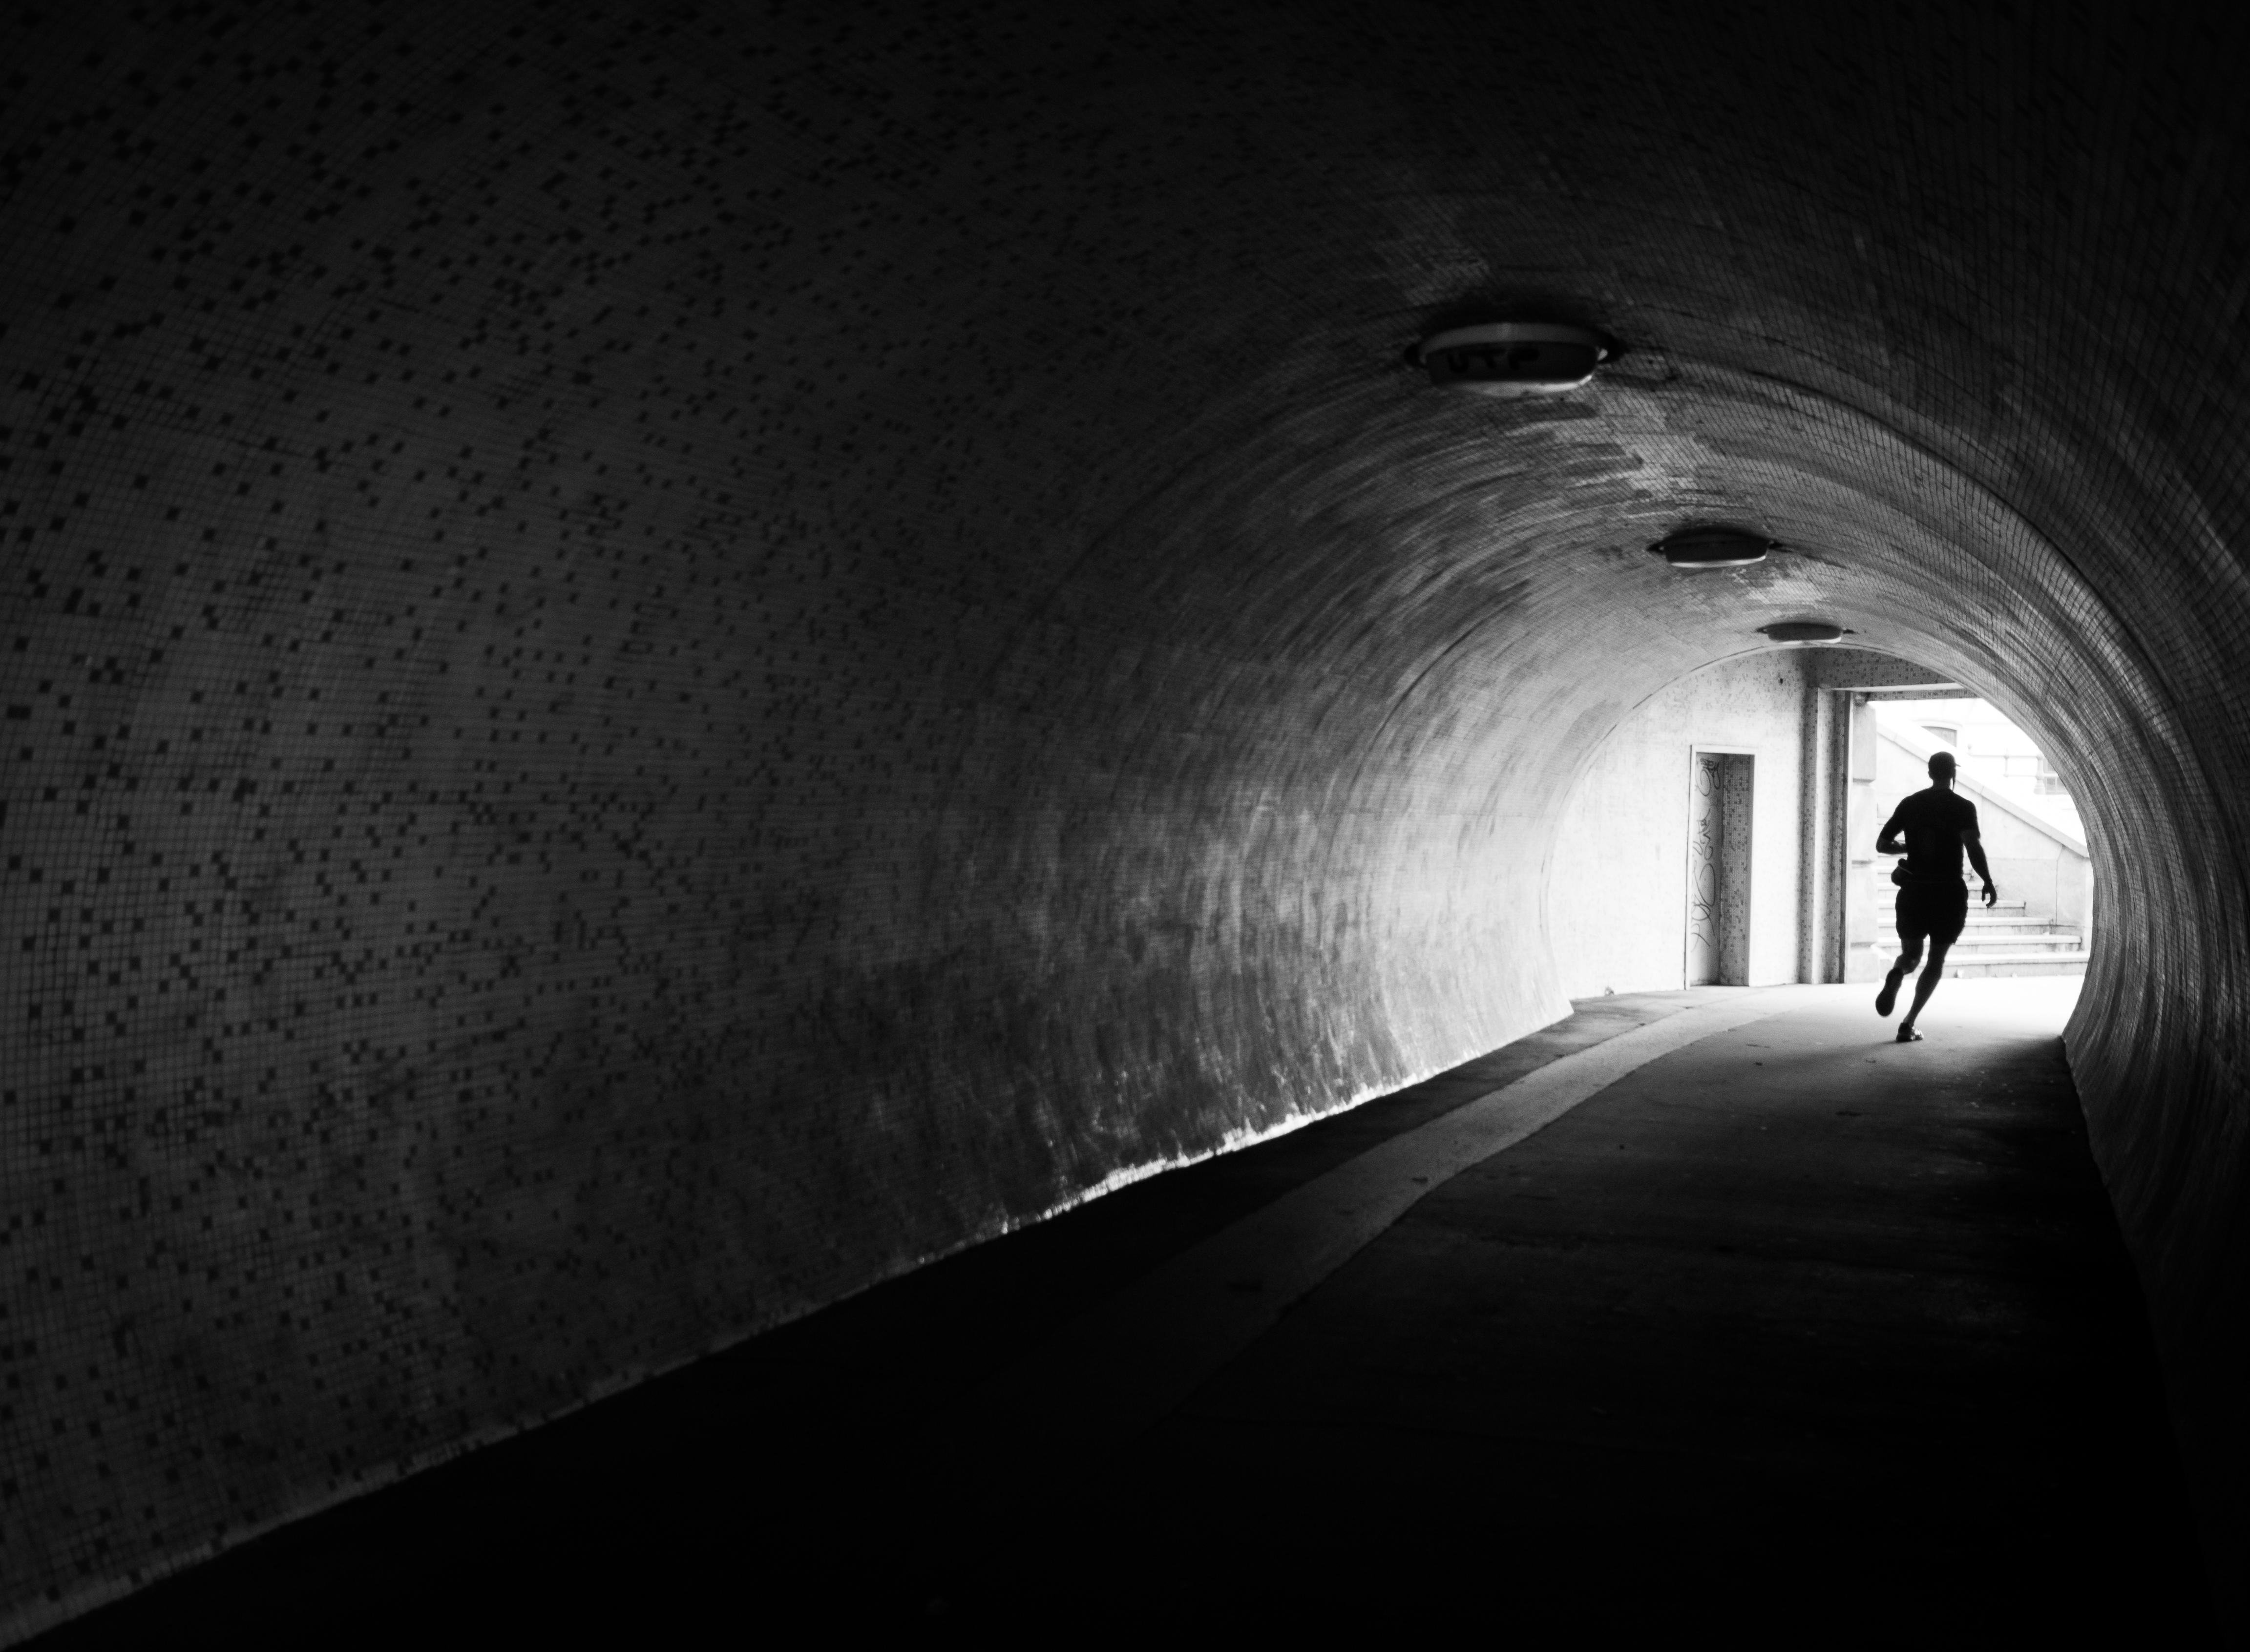 кузов, тоннели картинки в конце тоннеля идея